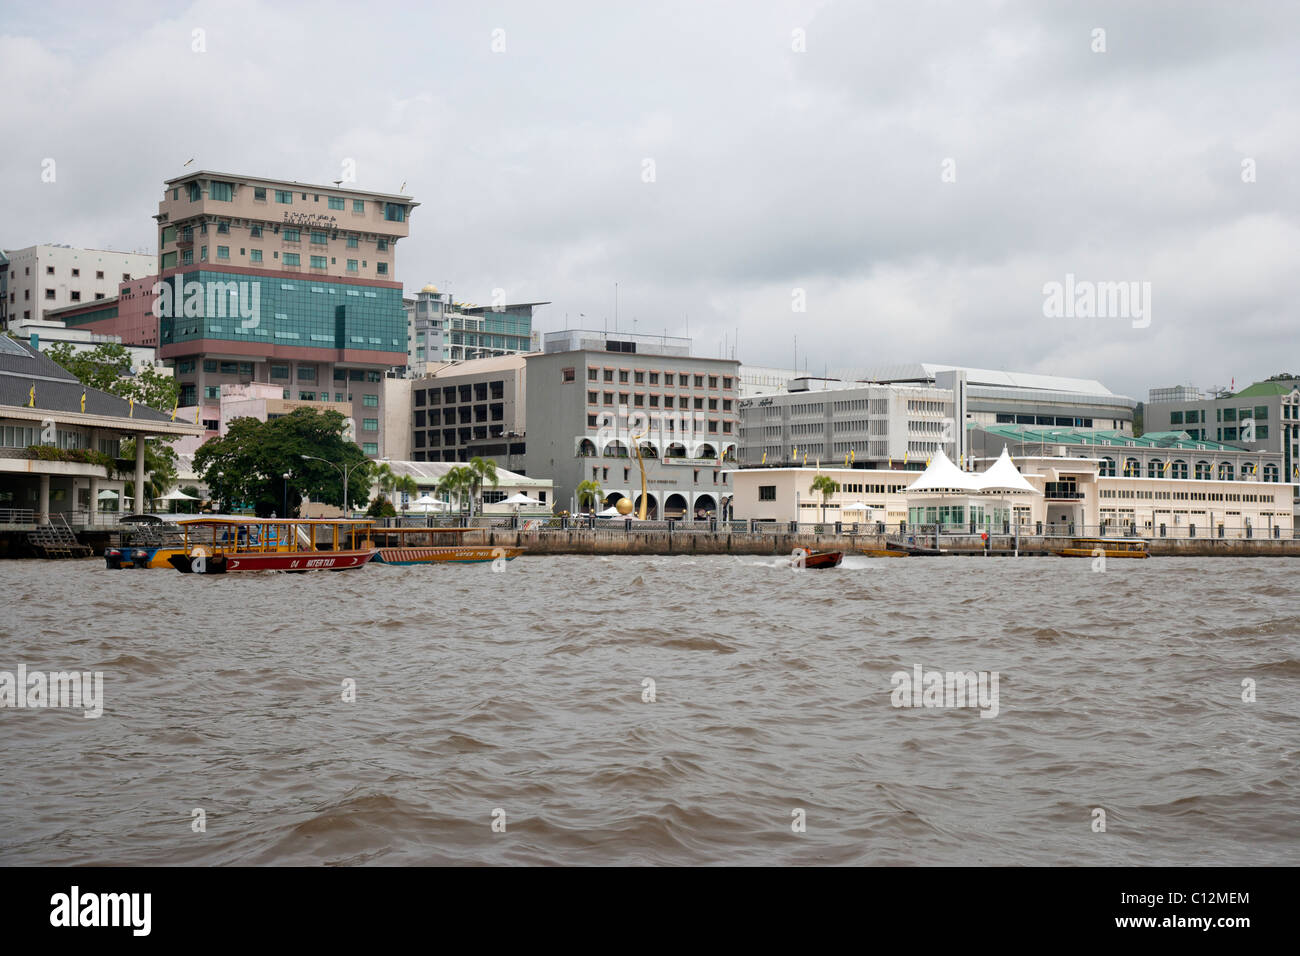 Bandar Seri Begawan, Brunei as seen from the River - Stock Image